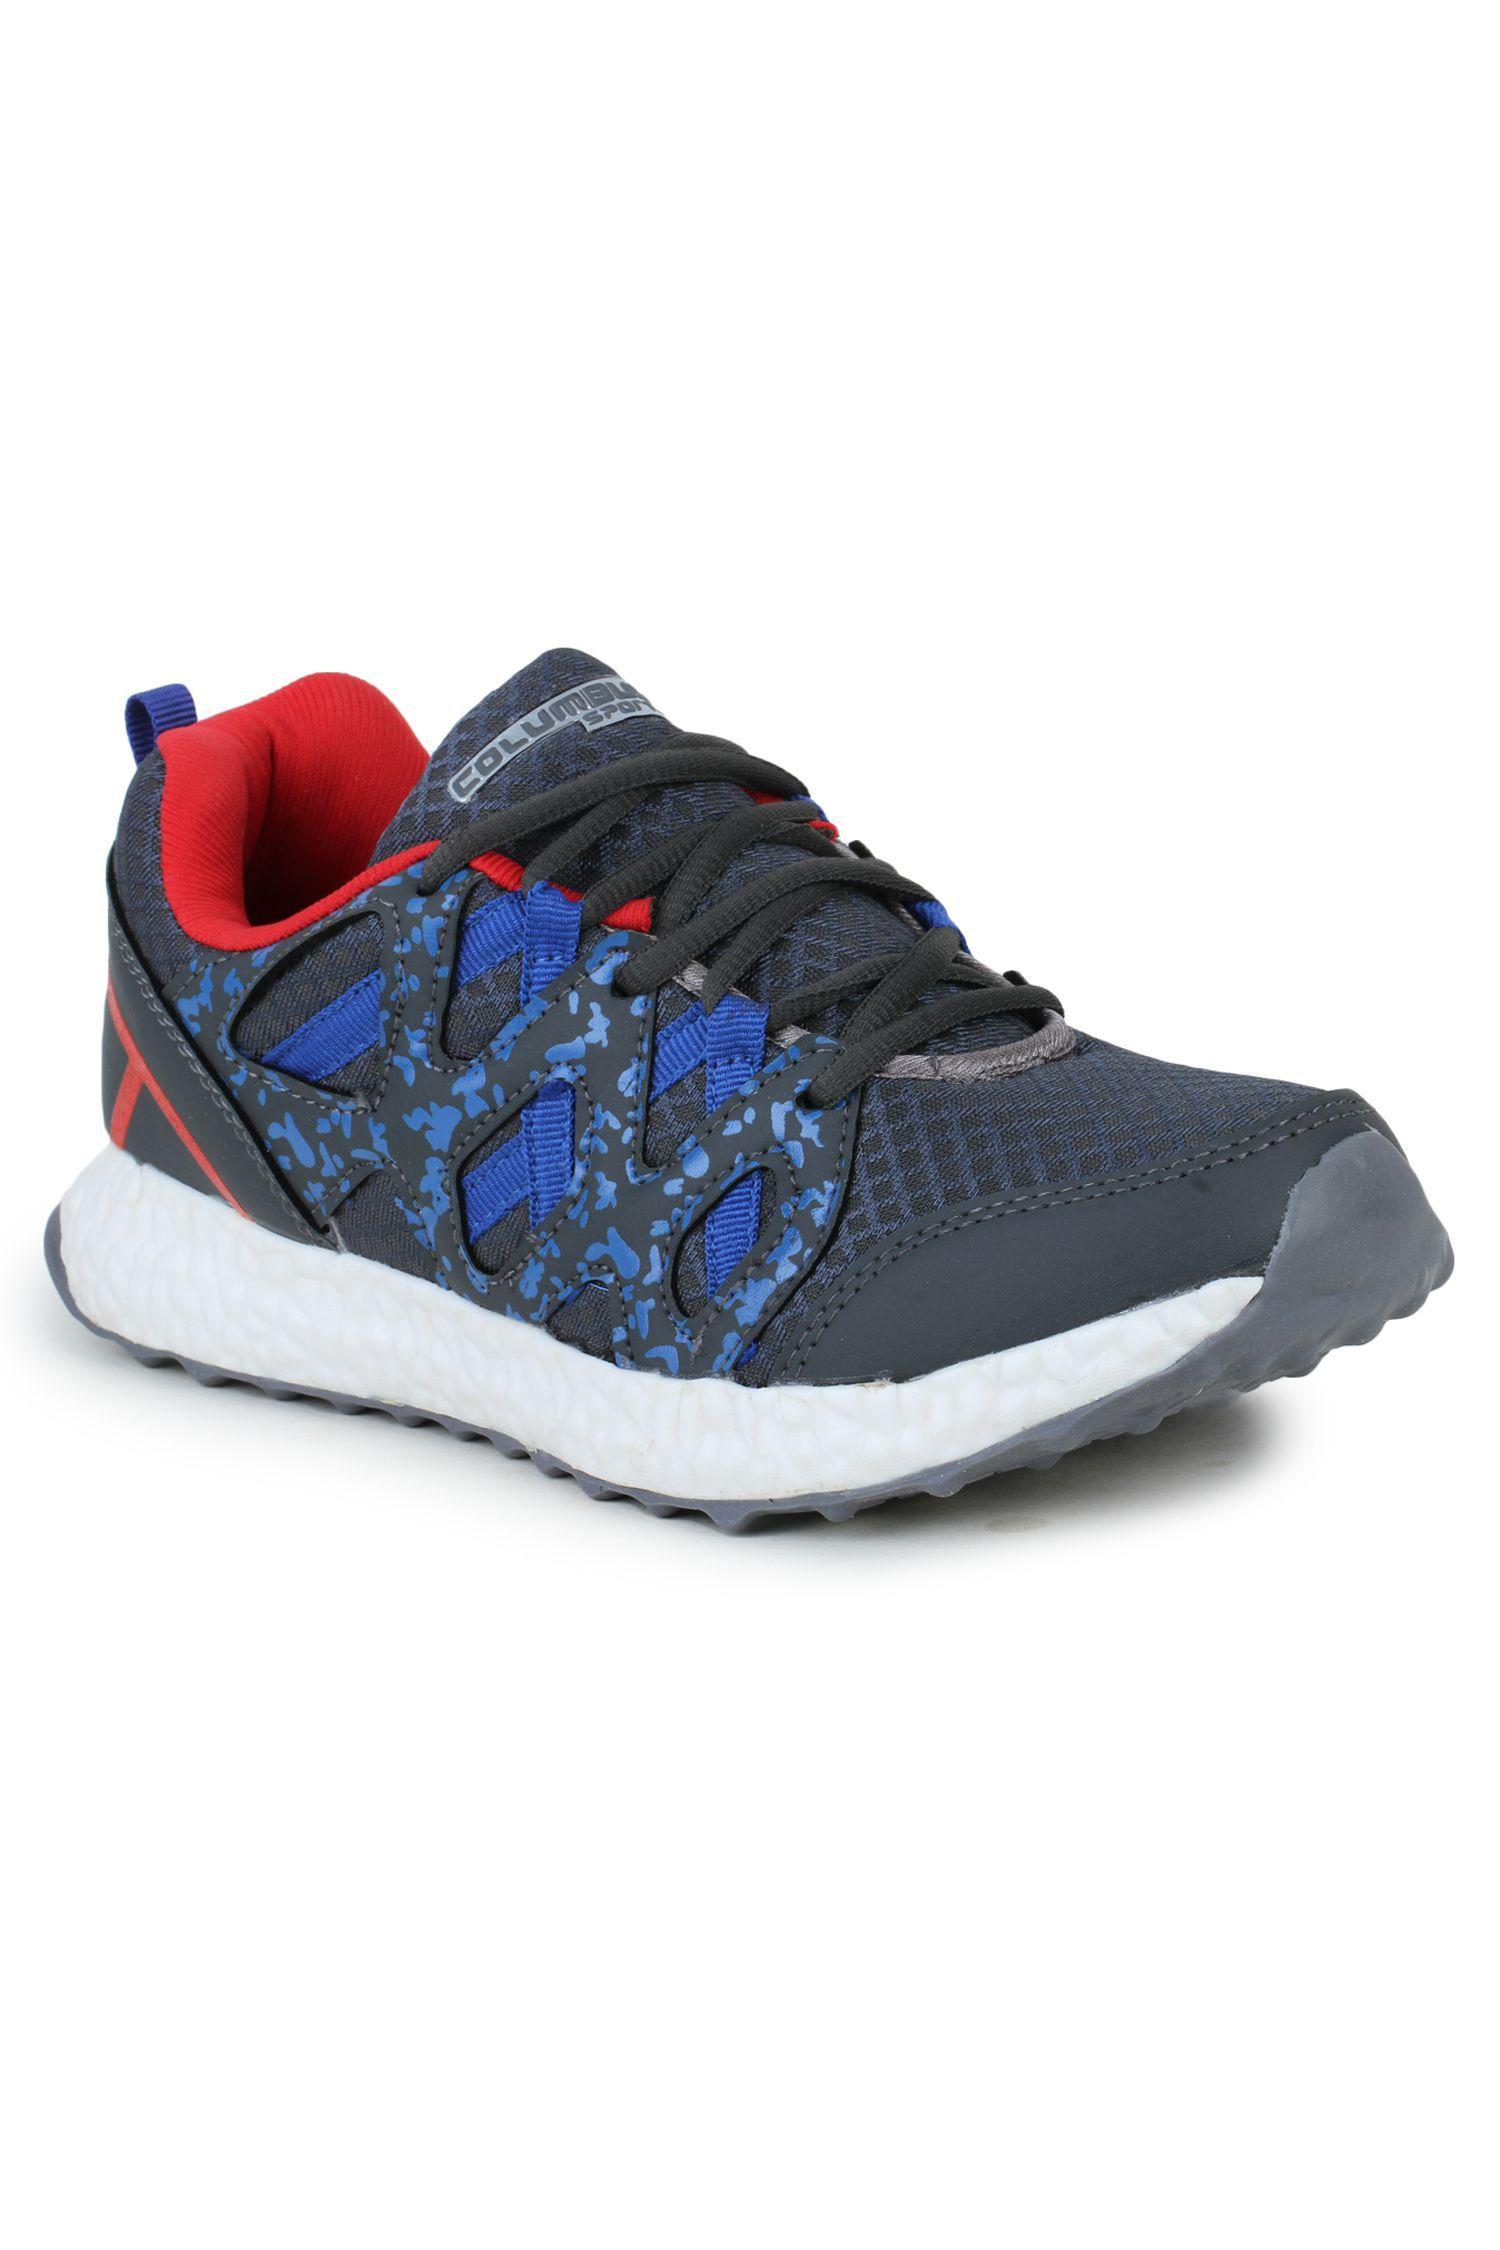 Columbus LD-0017-Grey Blue  Gray Running Shoes